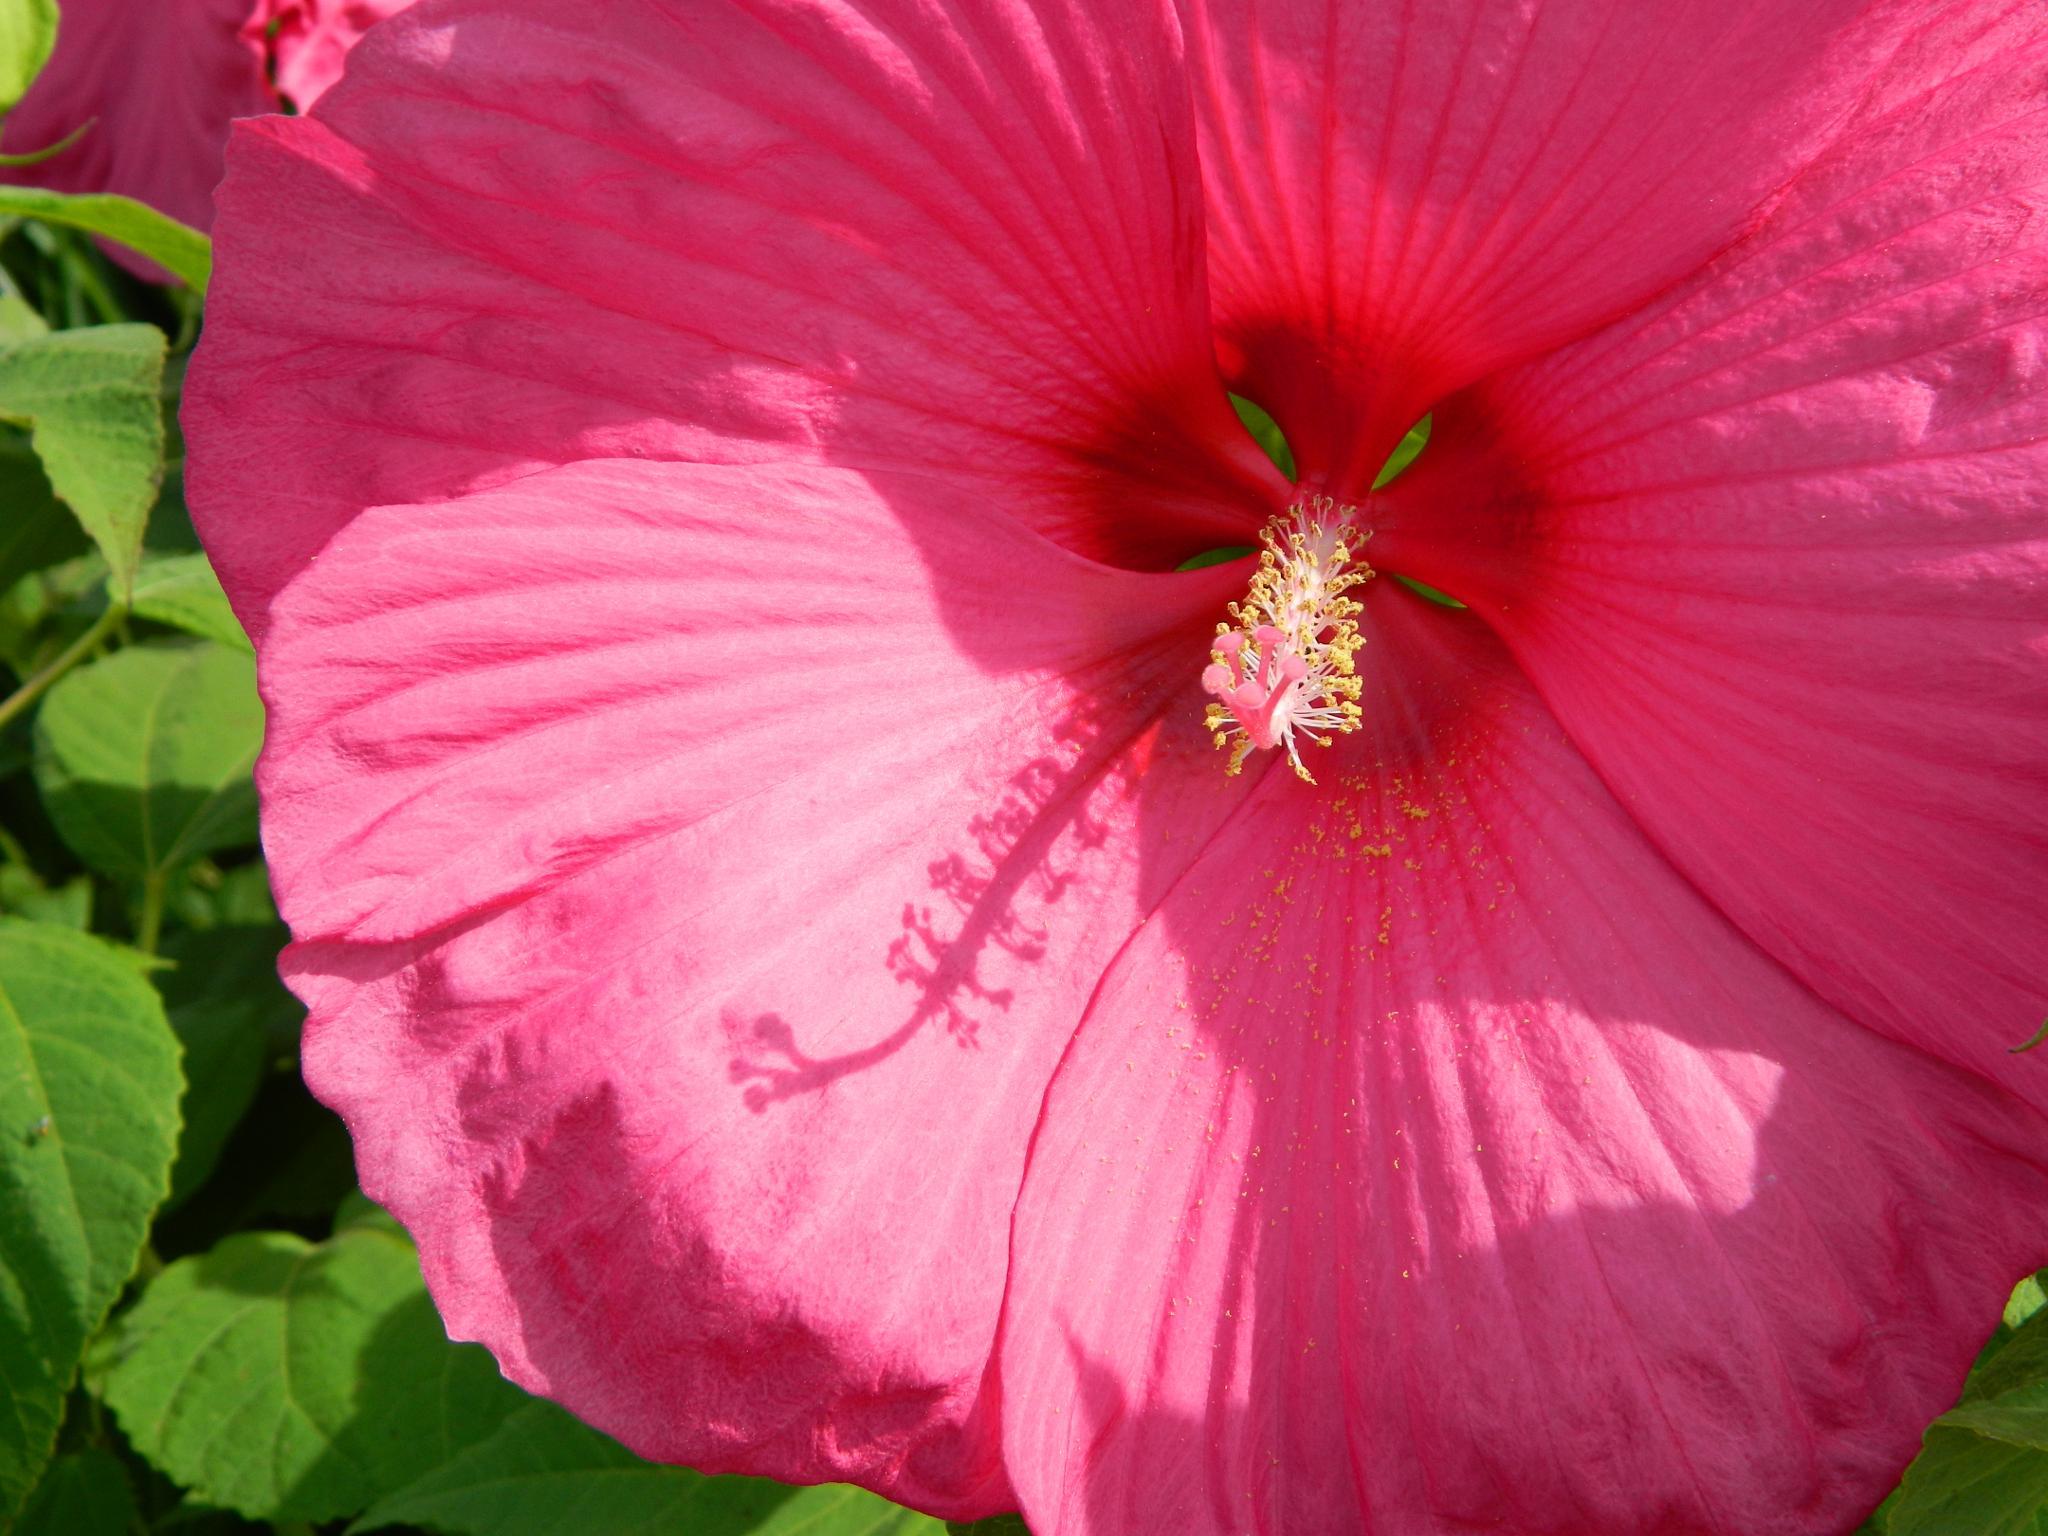 Hibiscus by janet renee'